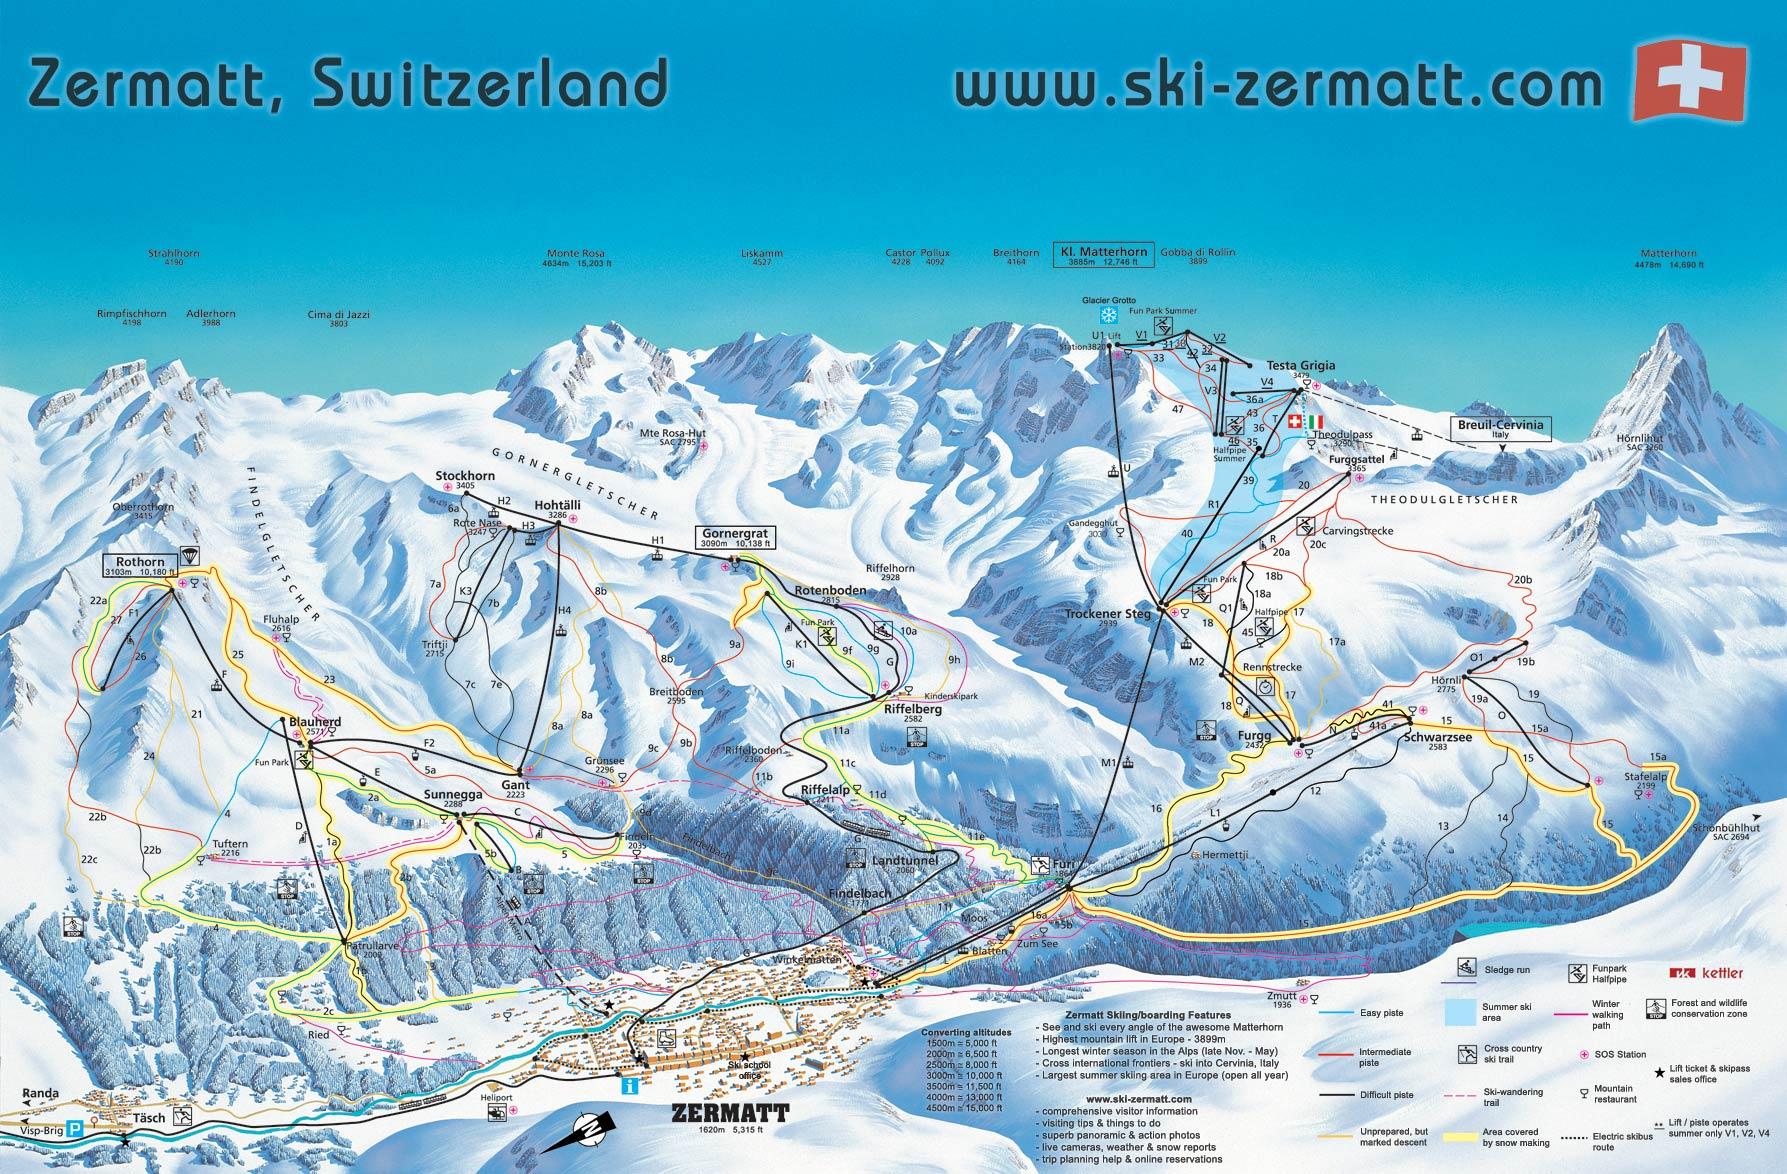 Photo courtesy of ski-zermatt.com